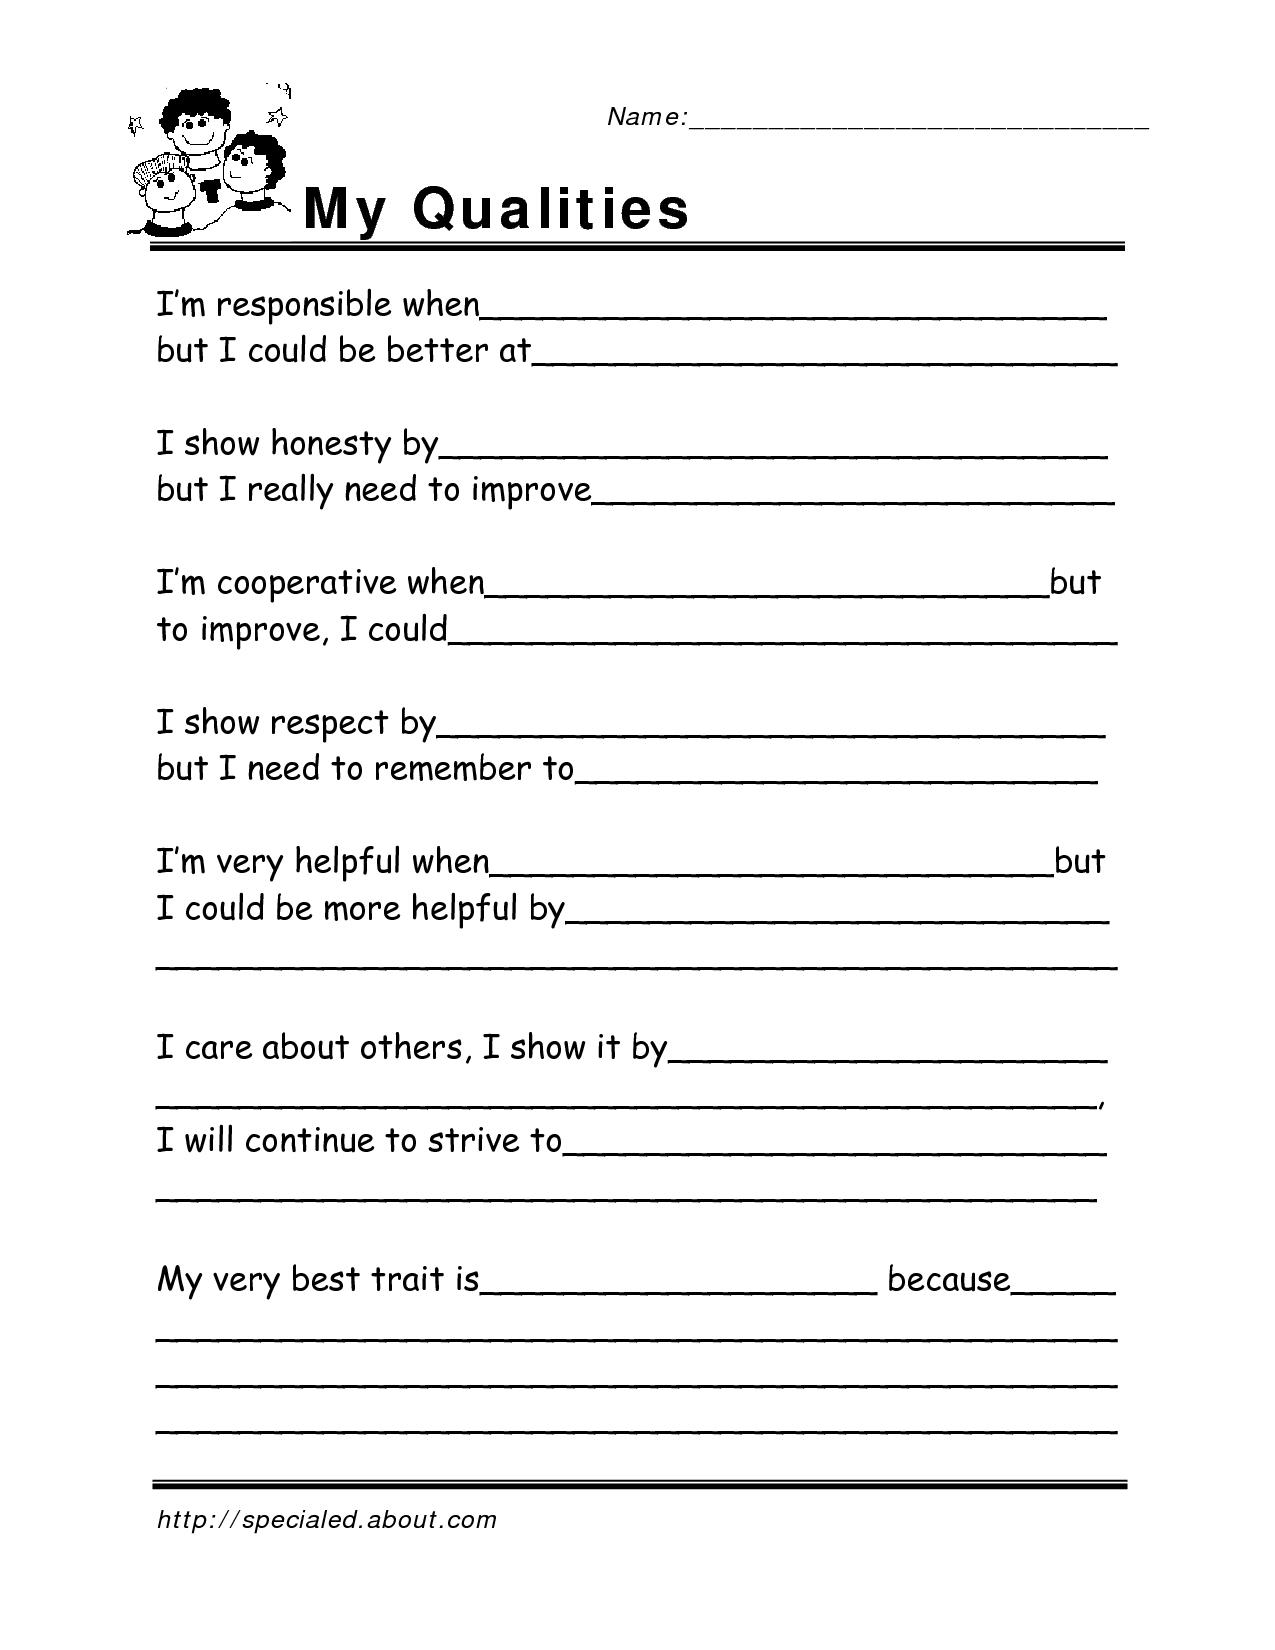 Worksheets Honesty Worksheets image result for healthy boundaries worksheet 10pk pinterest worksheet